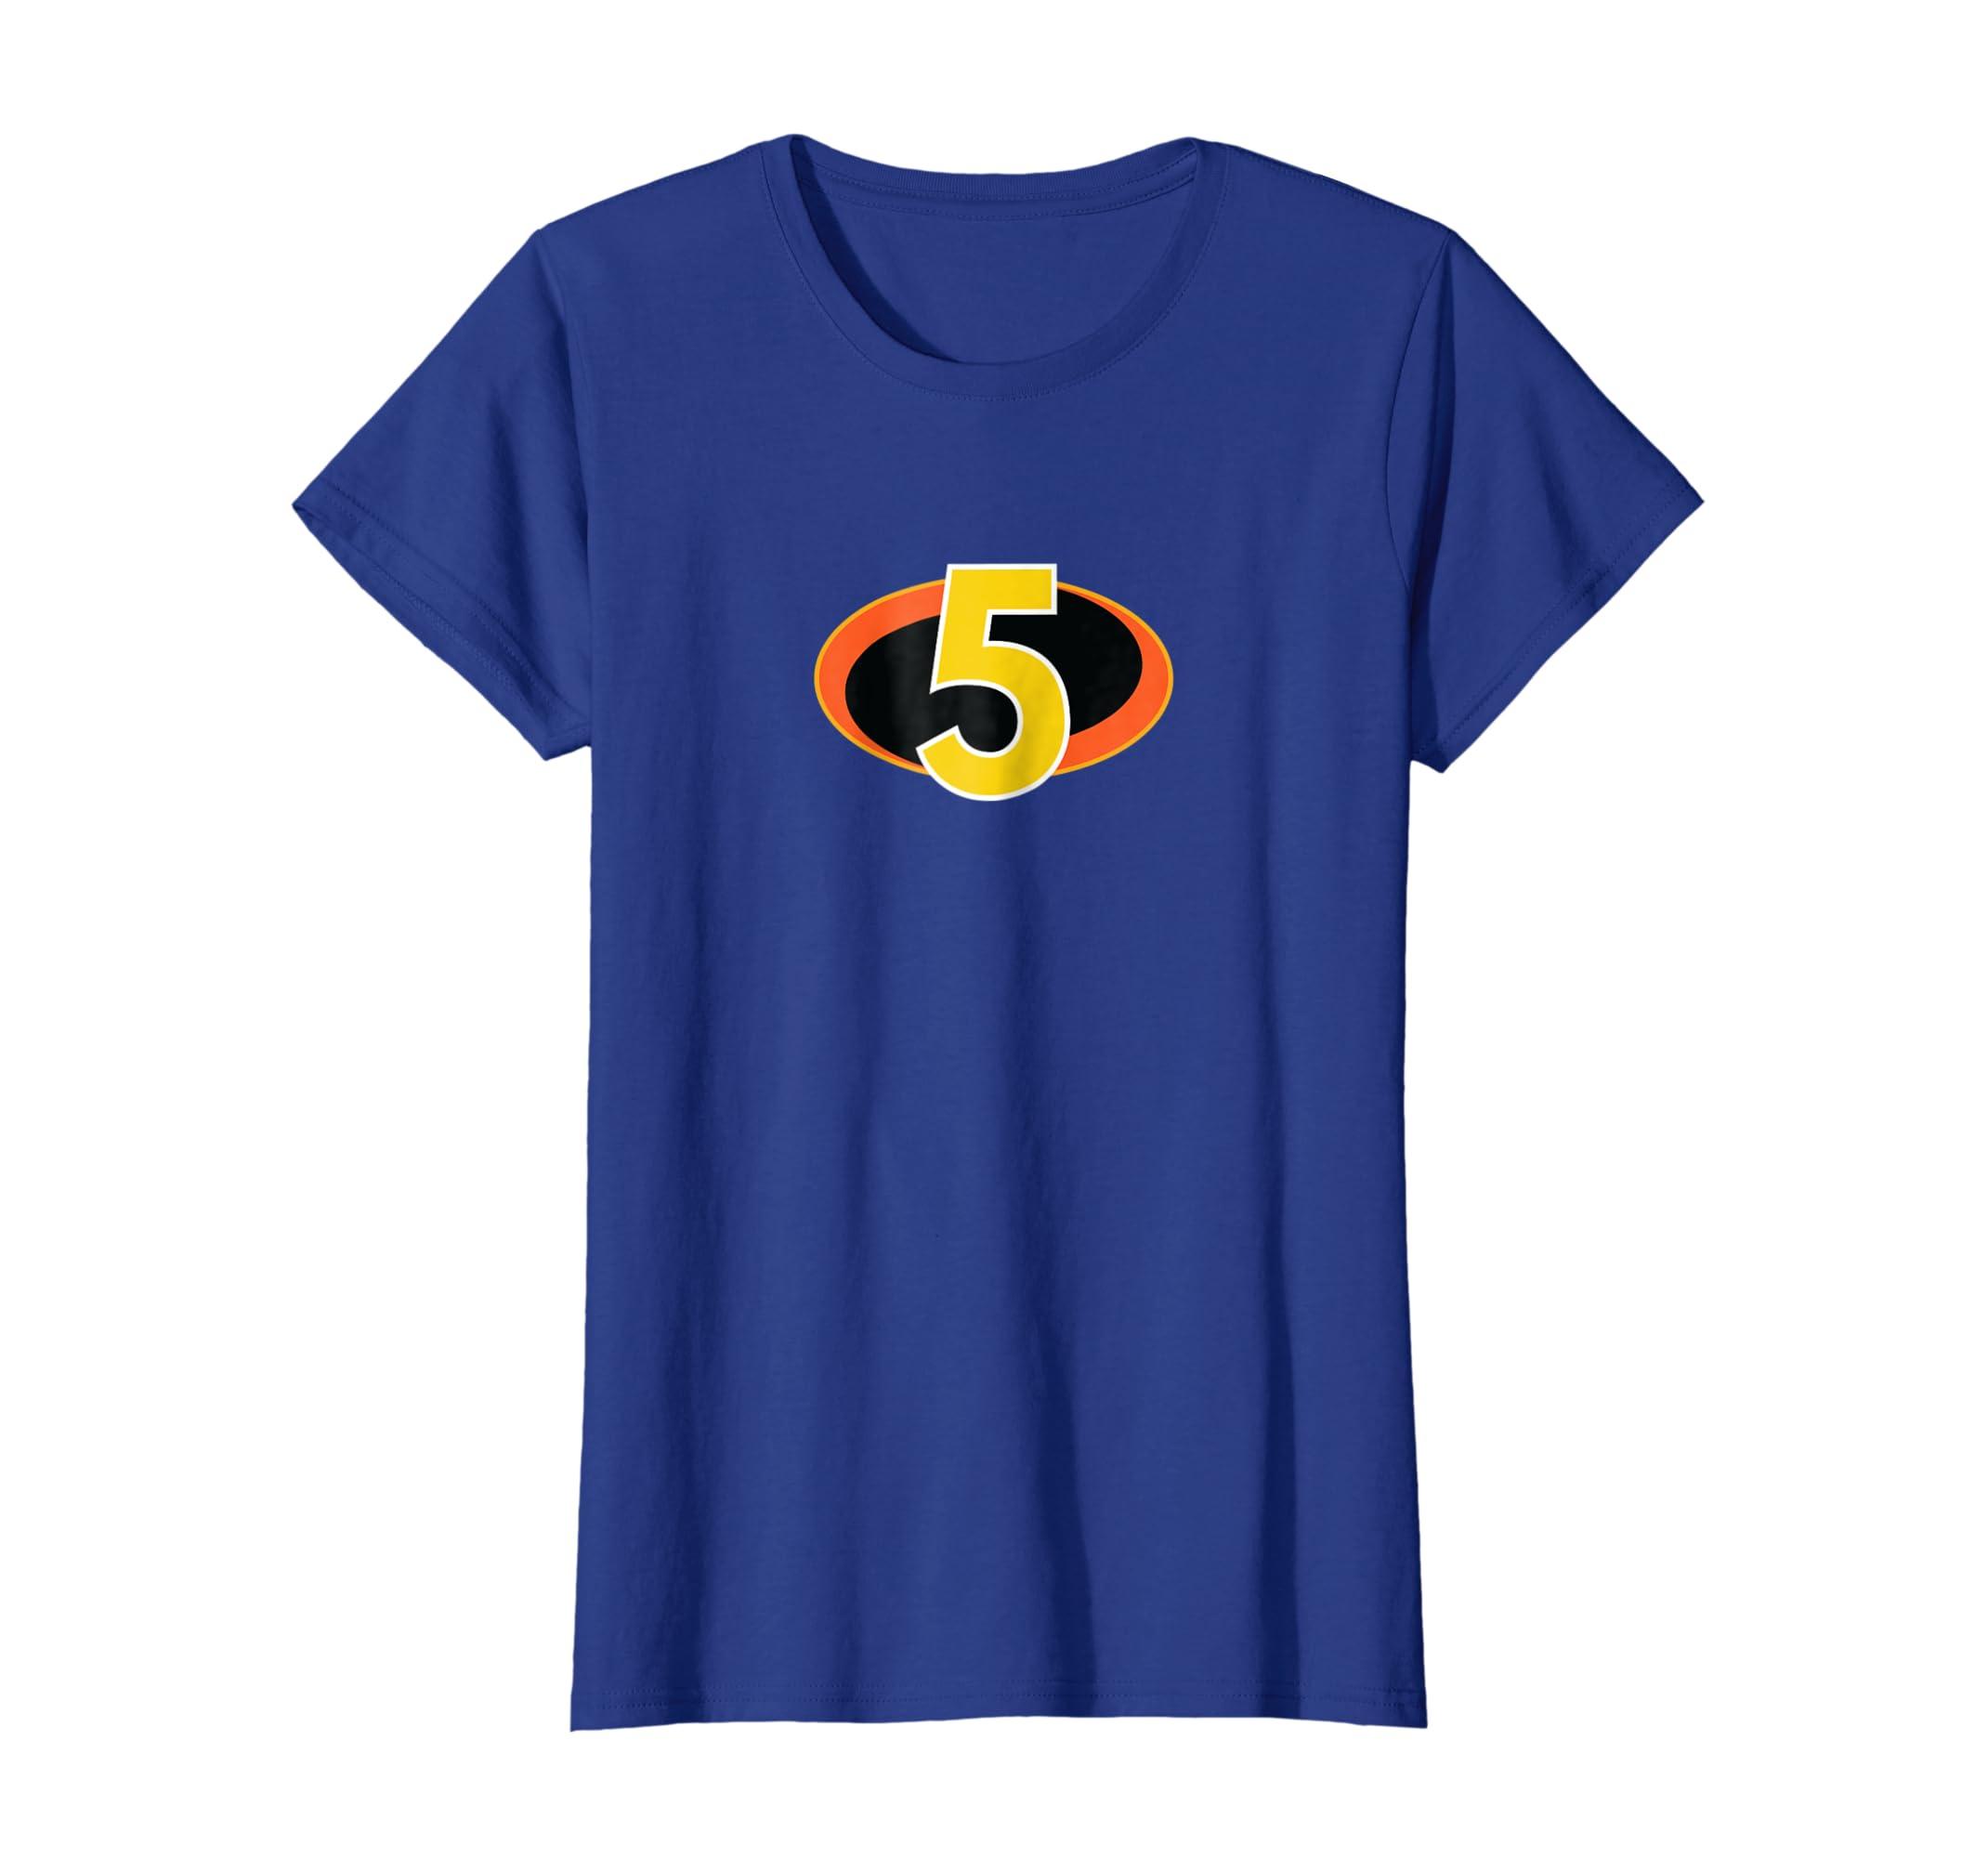 Amazon 5 Year Old Birthday T Shirt For Boys Or Girls Age Symbol Clothing